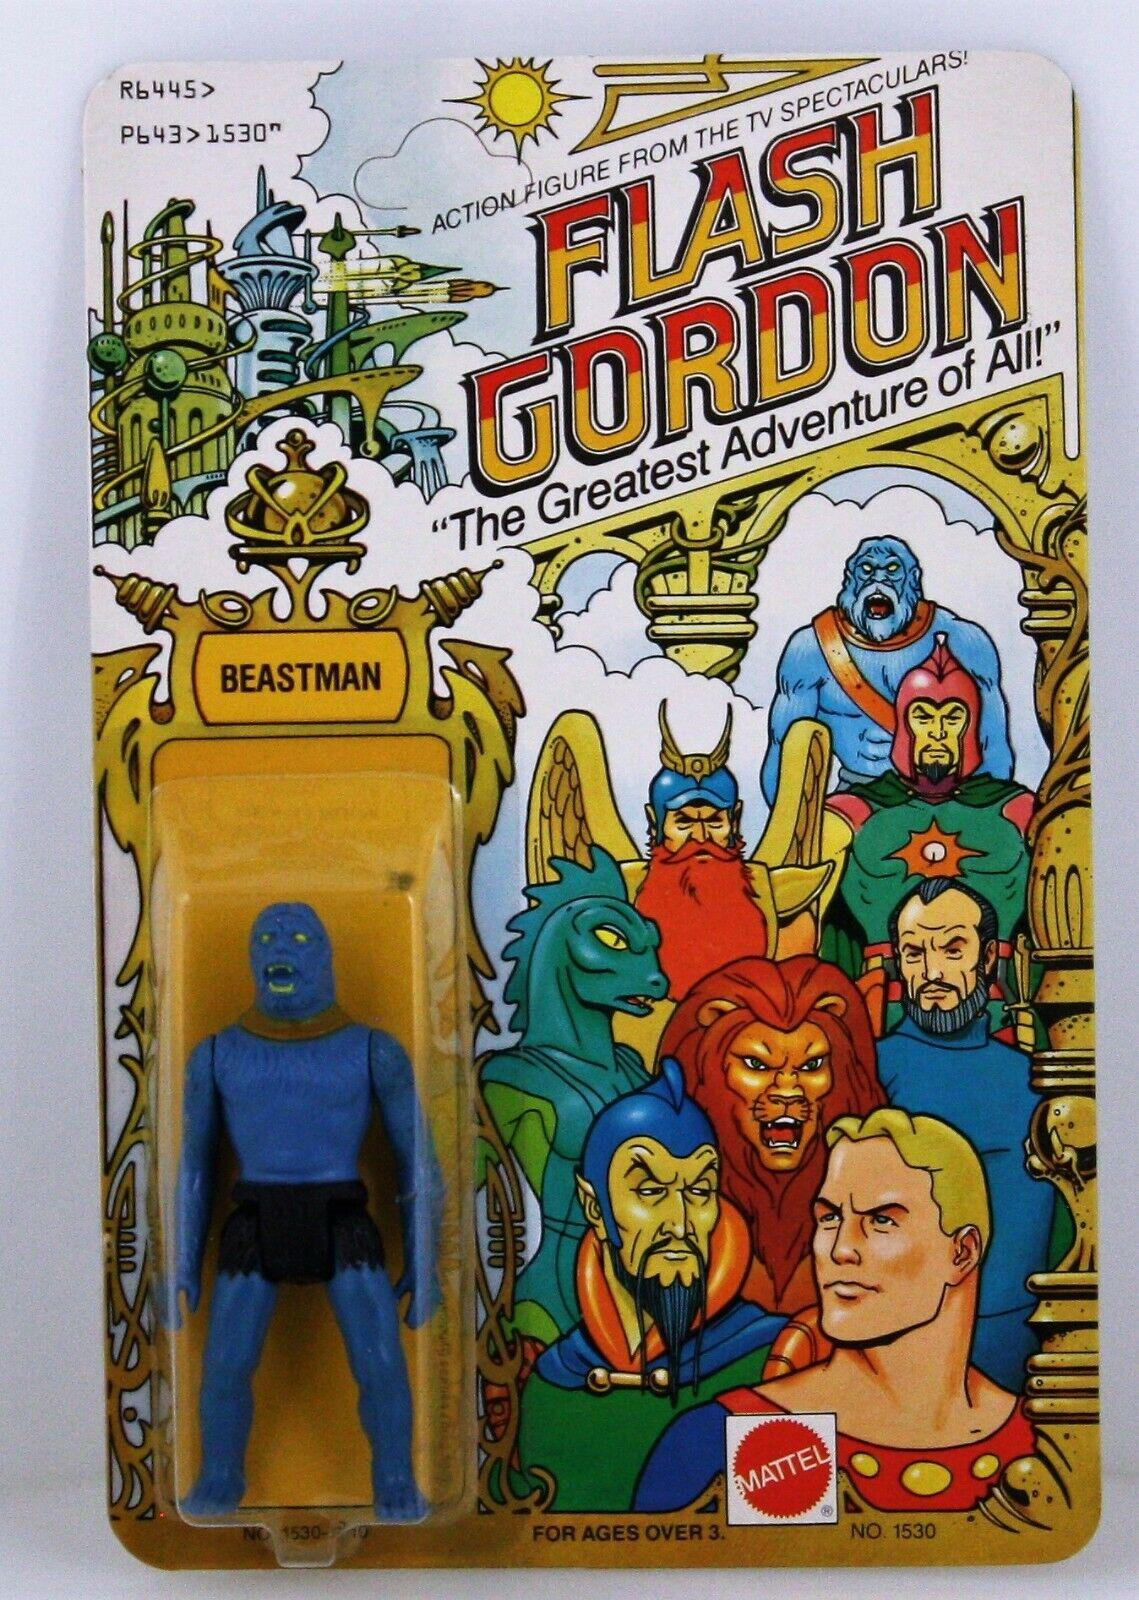 MATTEL  Flash Gordon  Beastman (1530)  Action Figure NEW 1979 UNPUNCHED